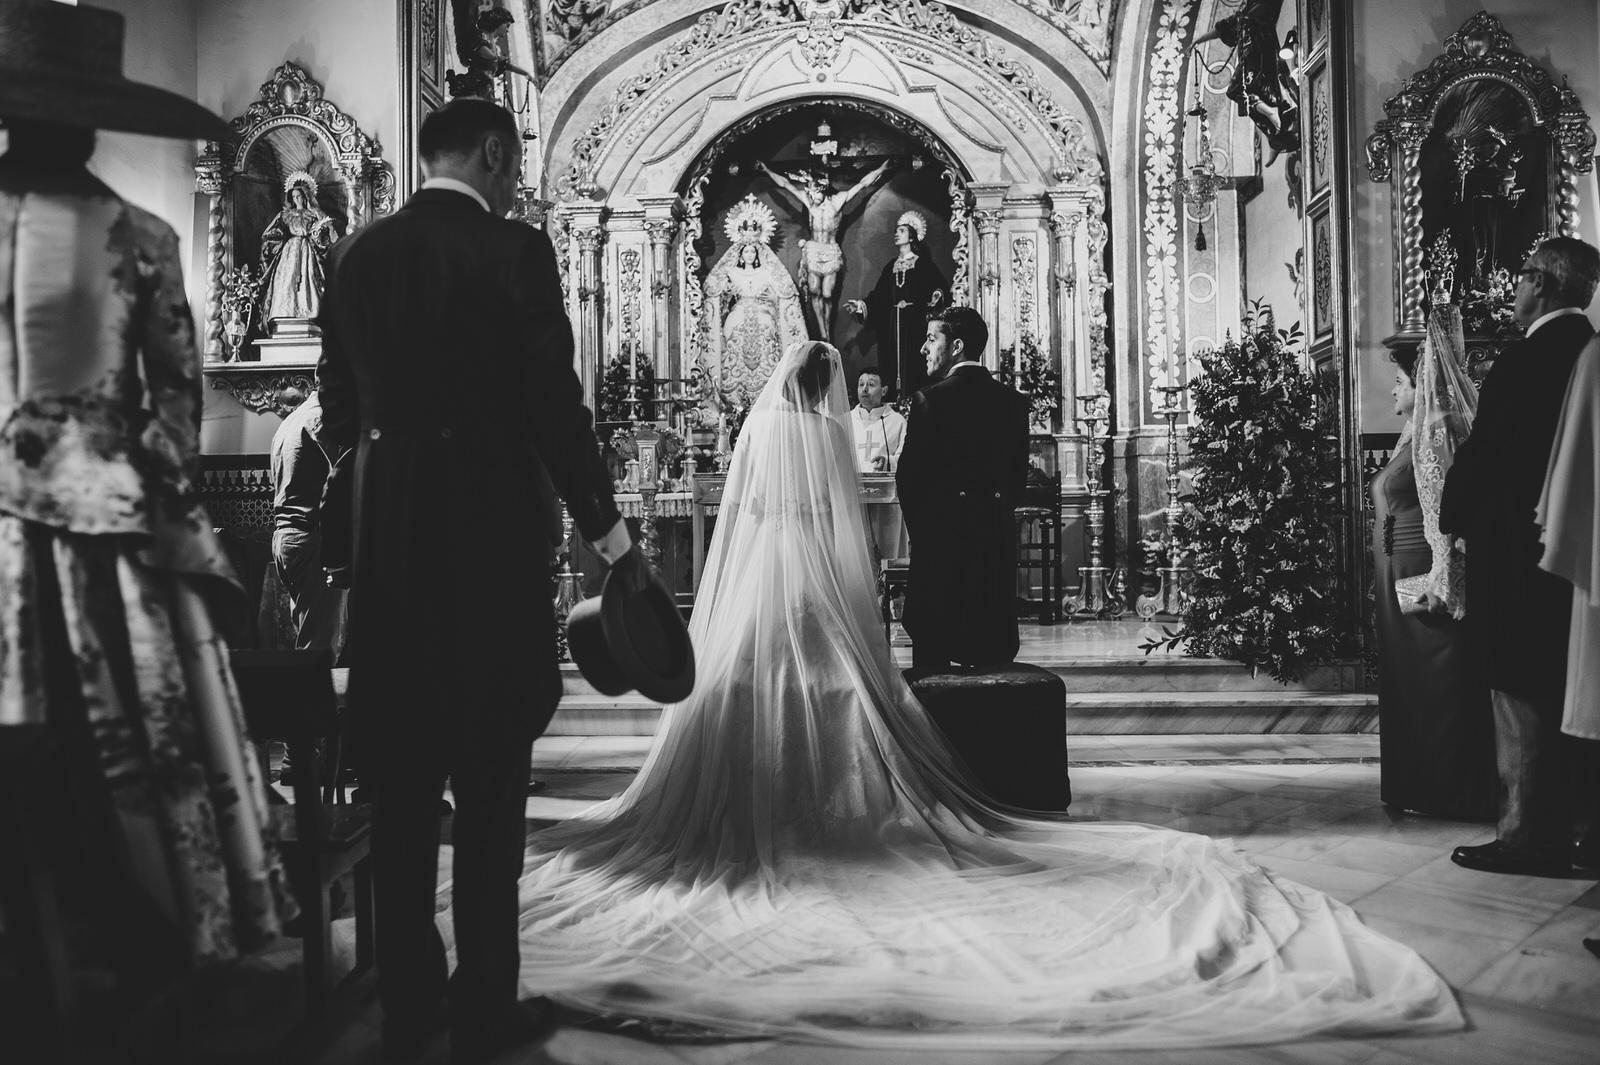 Judith & Gabriel - Boda en Olivares - Albaida, Fotógrafo de boda Andrés Amarillo - 25.JPG